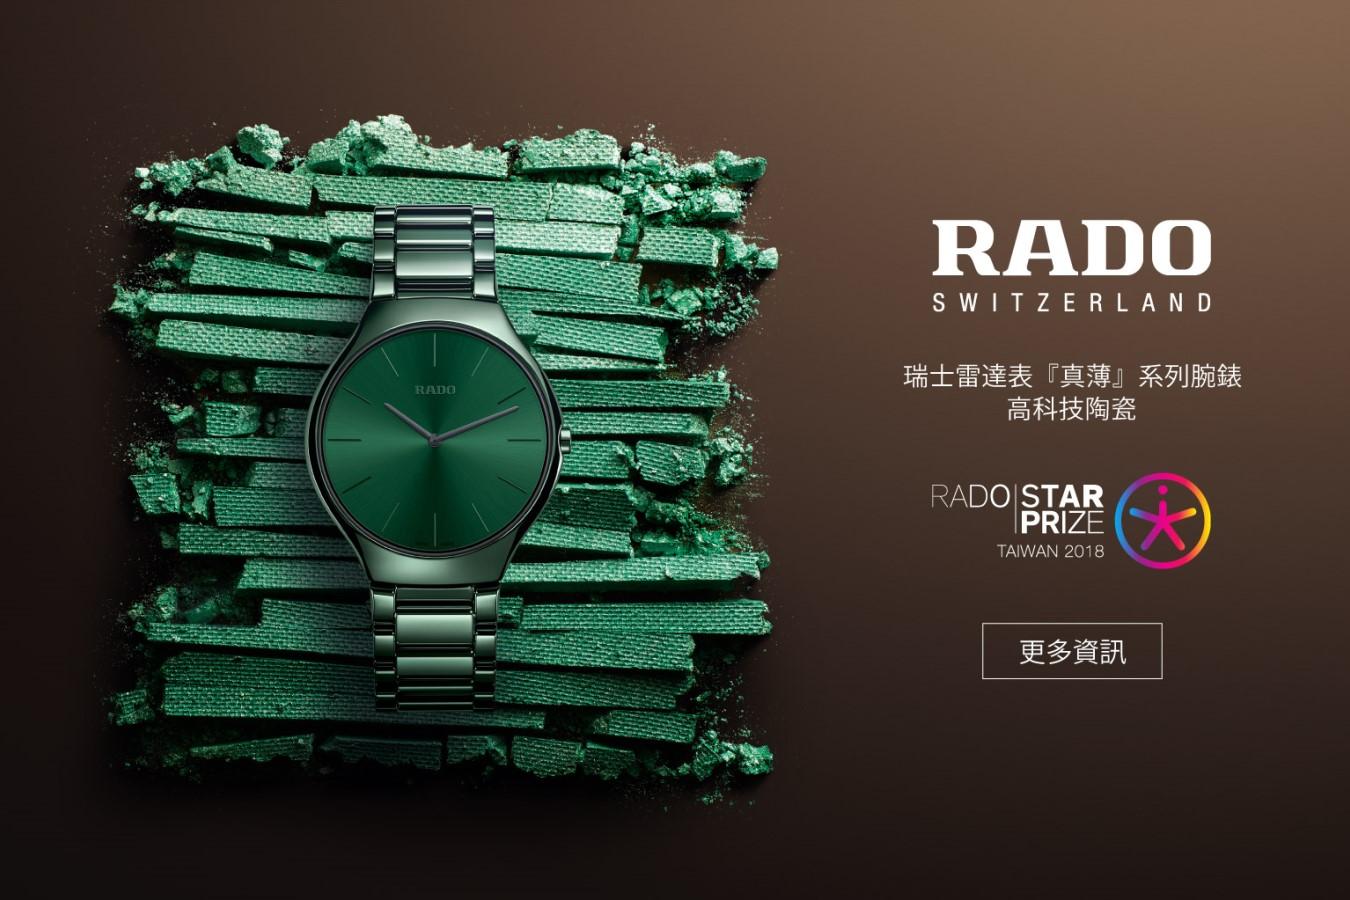 Rado瑞士雷達表2018第二屆臺灣創星大賽開跑  「靈感源於自然」創新作品熱烈徵件募集中